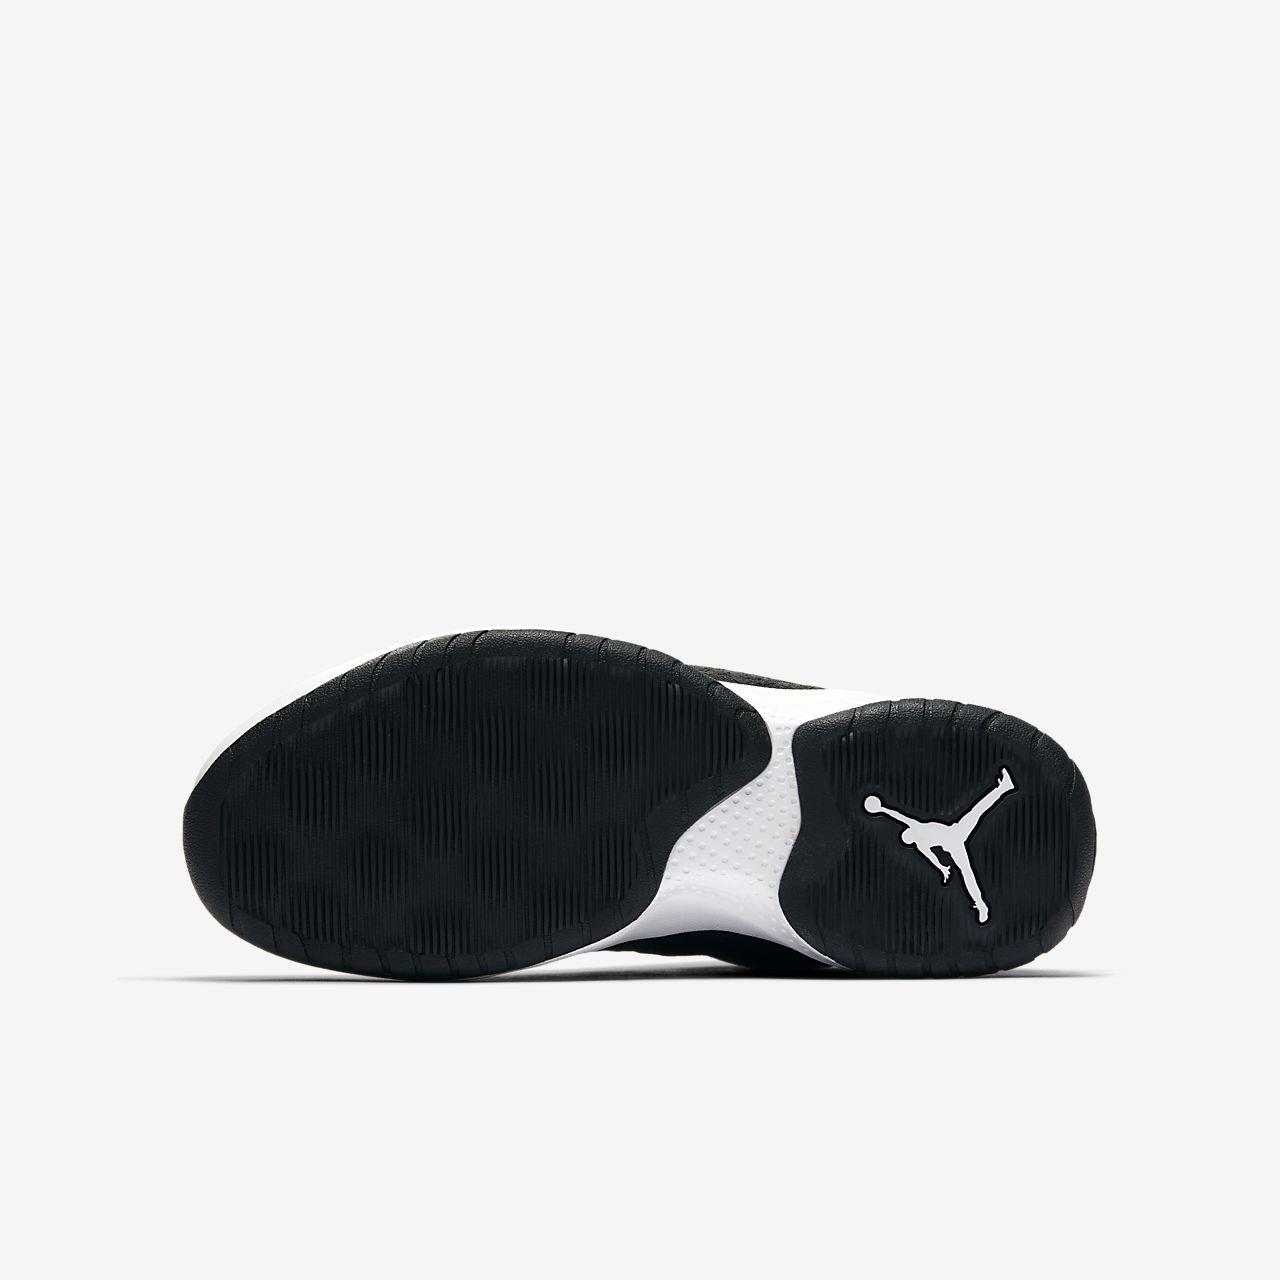 Norge 2020 Nike Barn Lebron Soldier Xii Basketball Sko Svart